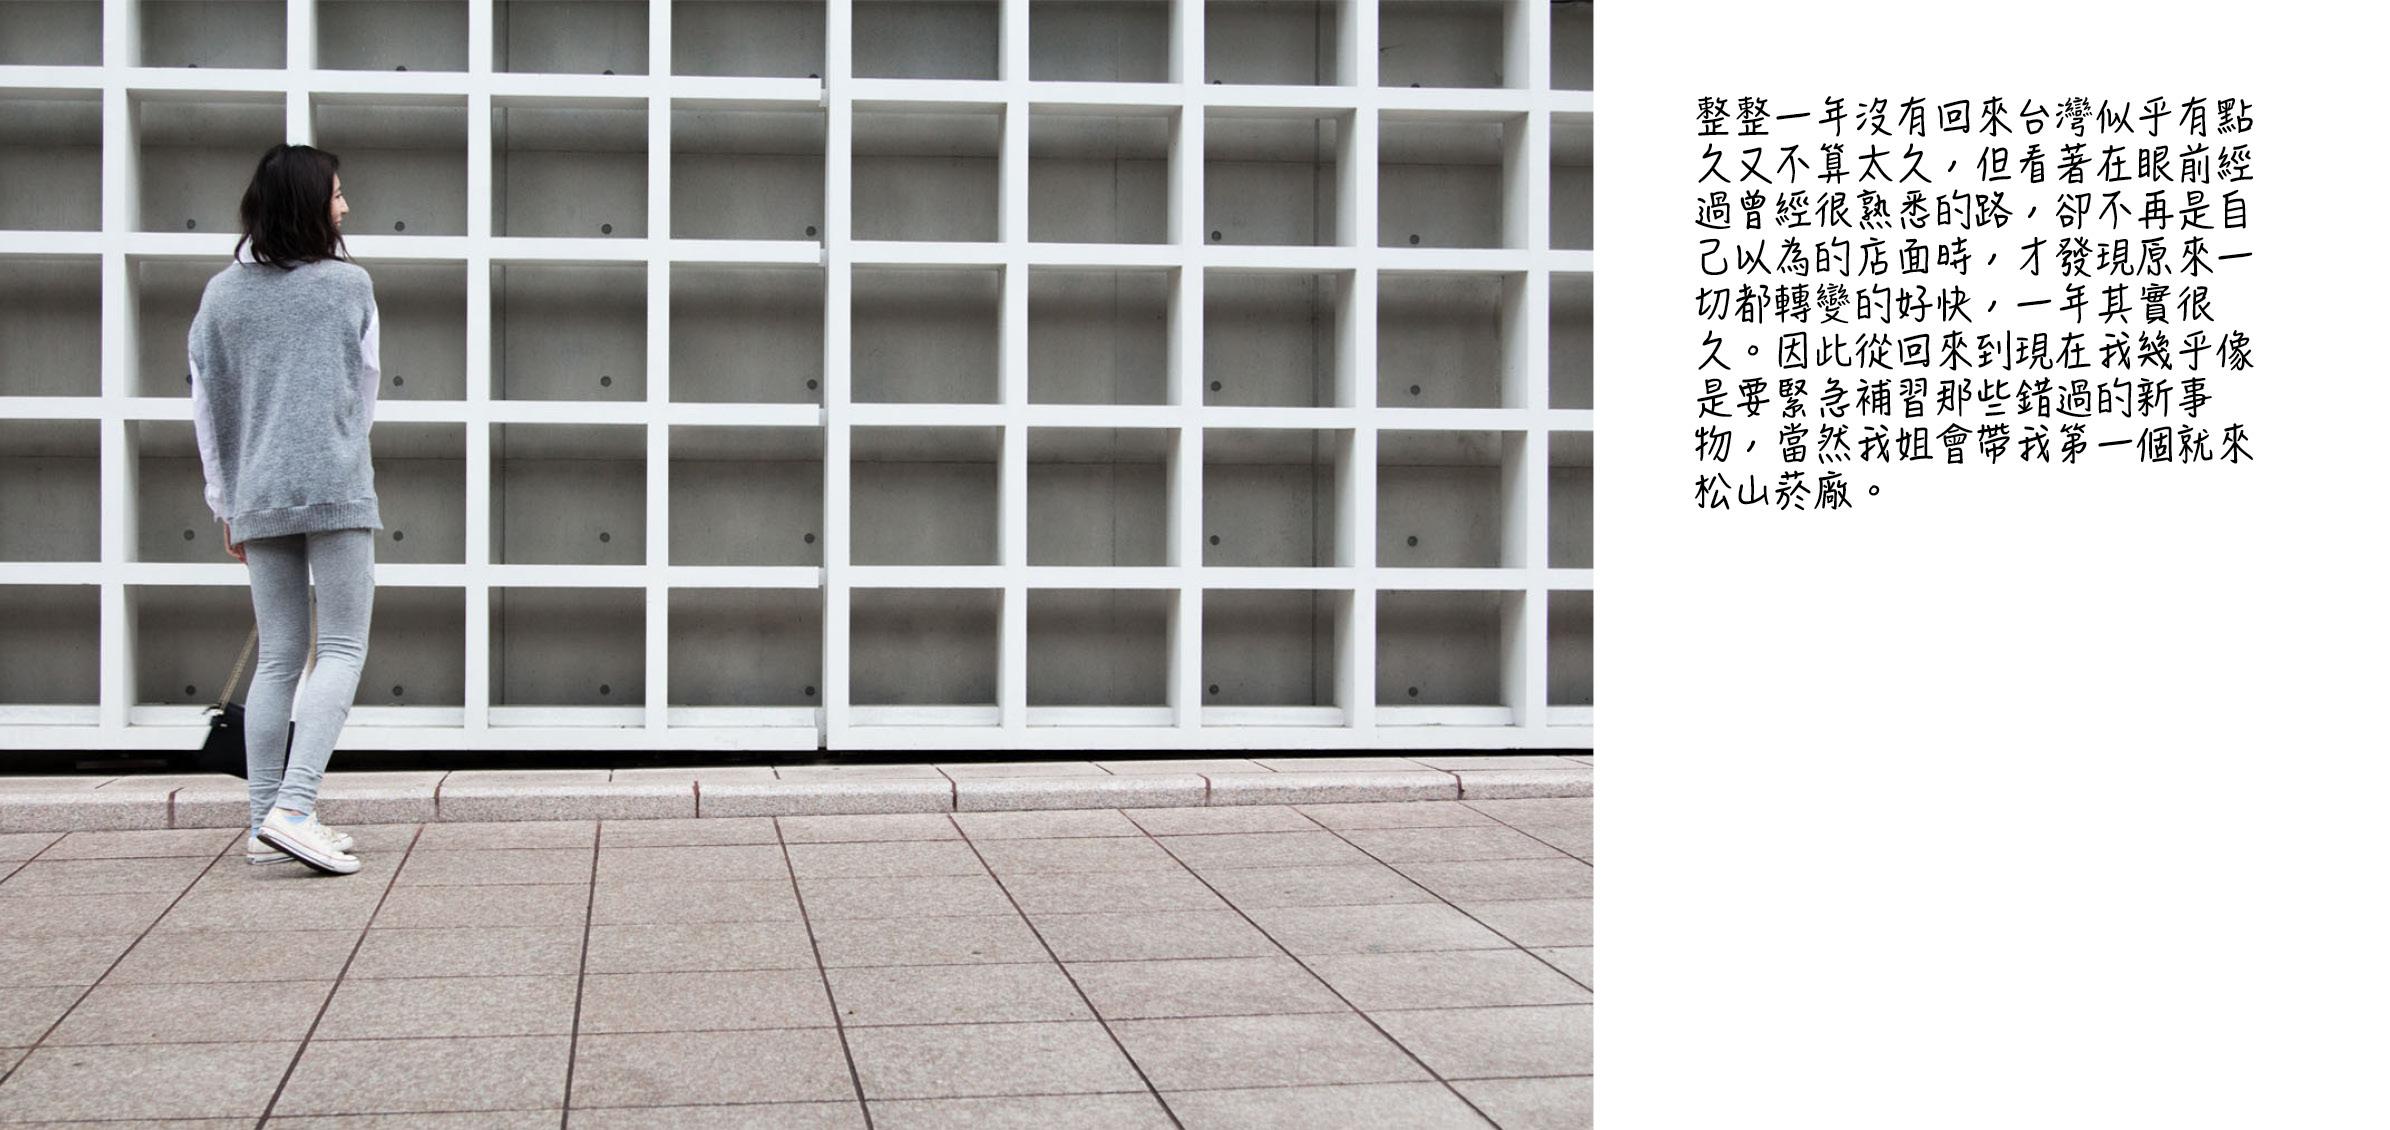 Rice & Shine - Travel Blog - Simplicity 2.jpg